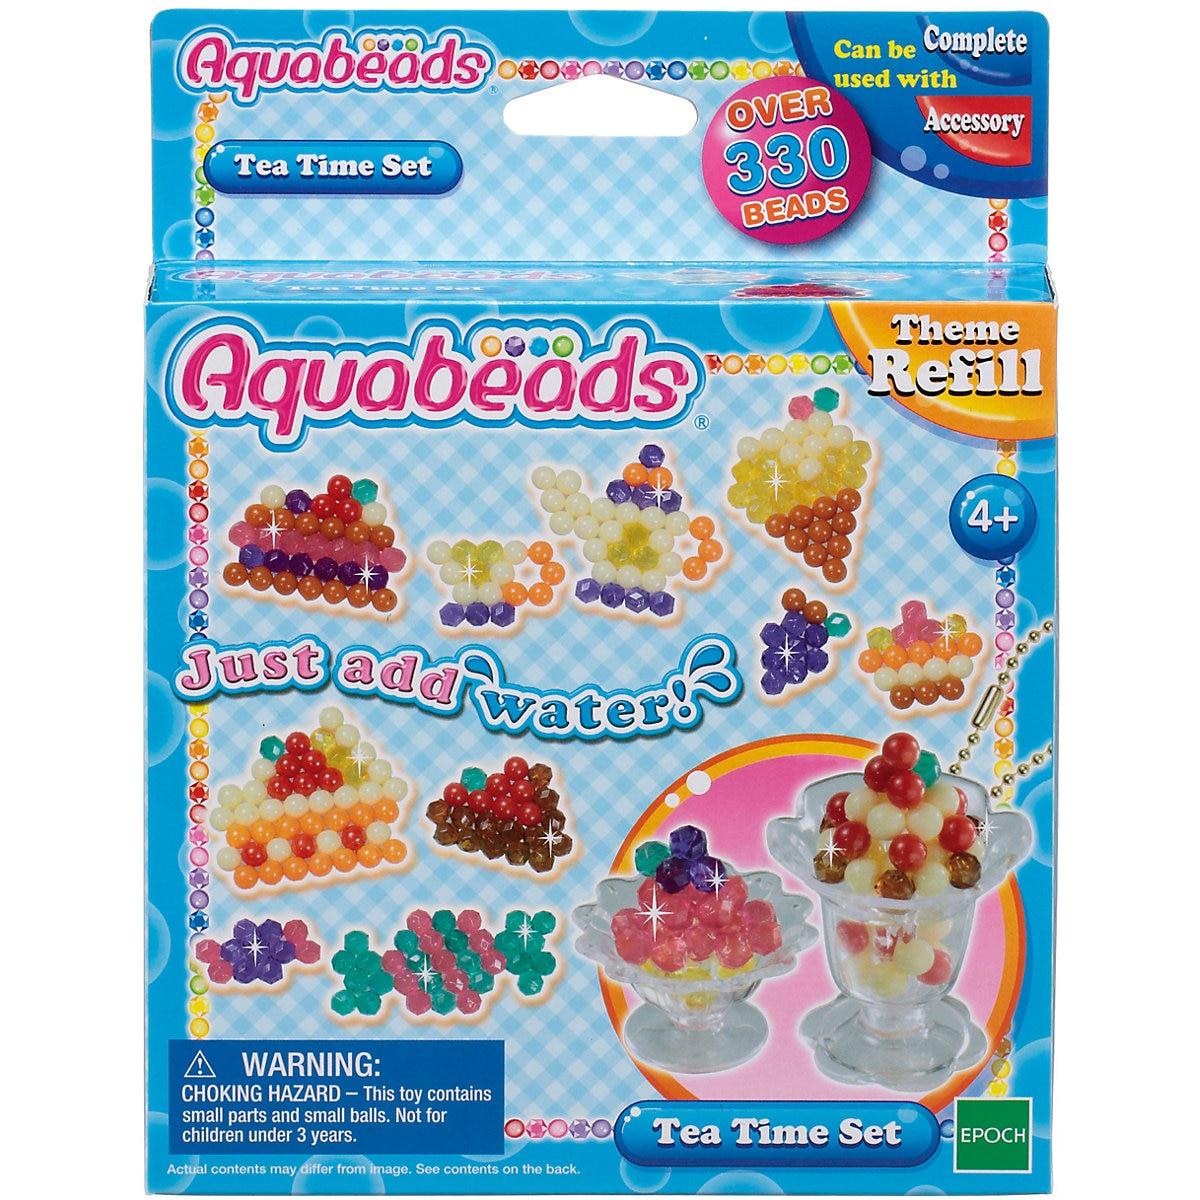 Aquabeads Beads Toys 7240126 Creativity Needlework For Children Set Kids Toy Hobbis Arts Crafts DIY